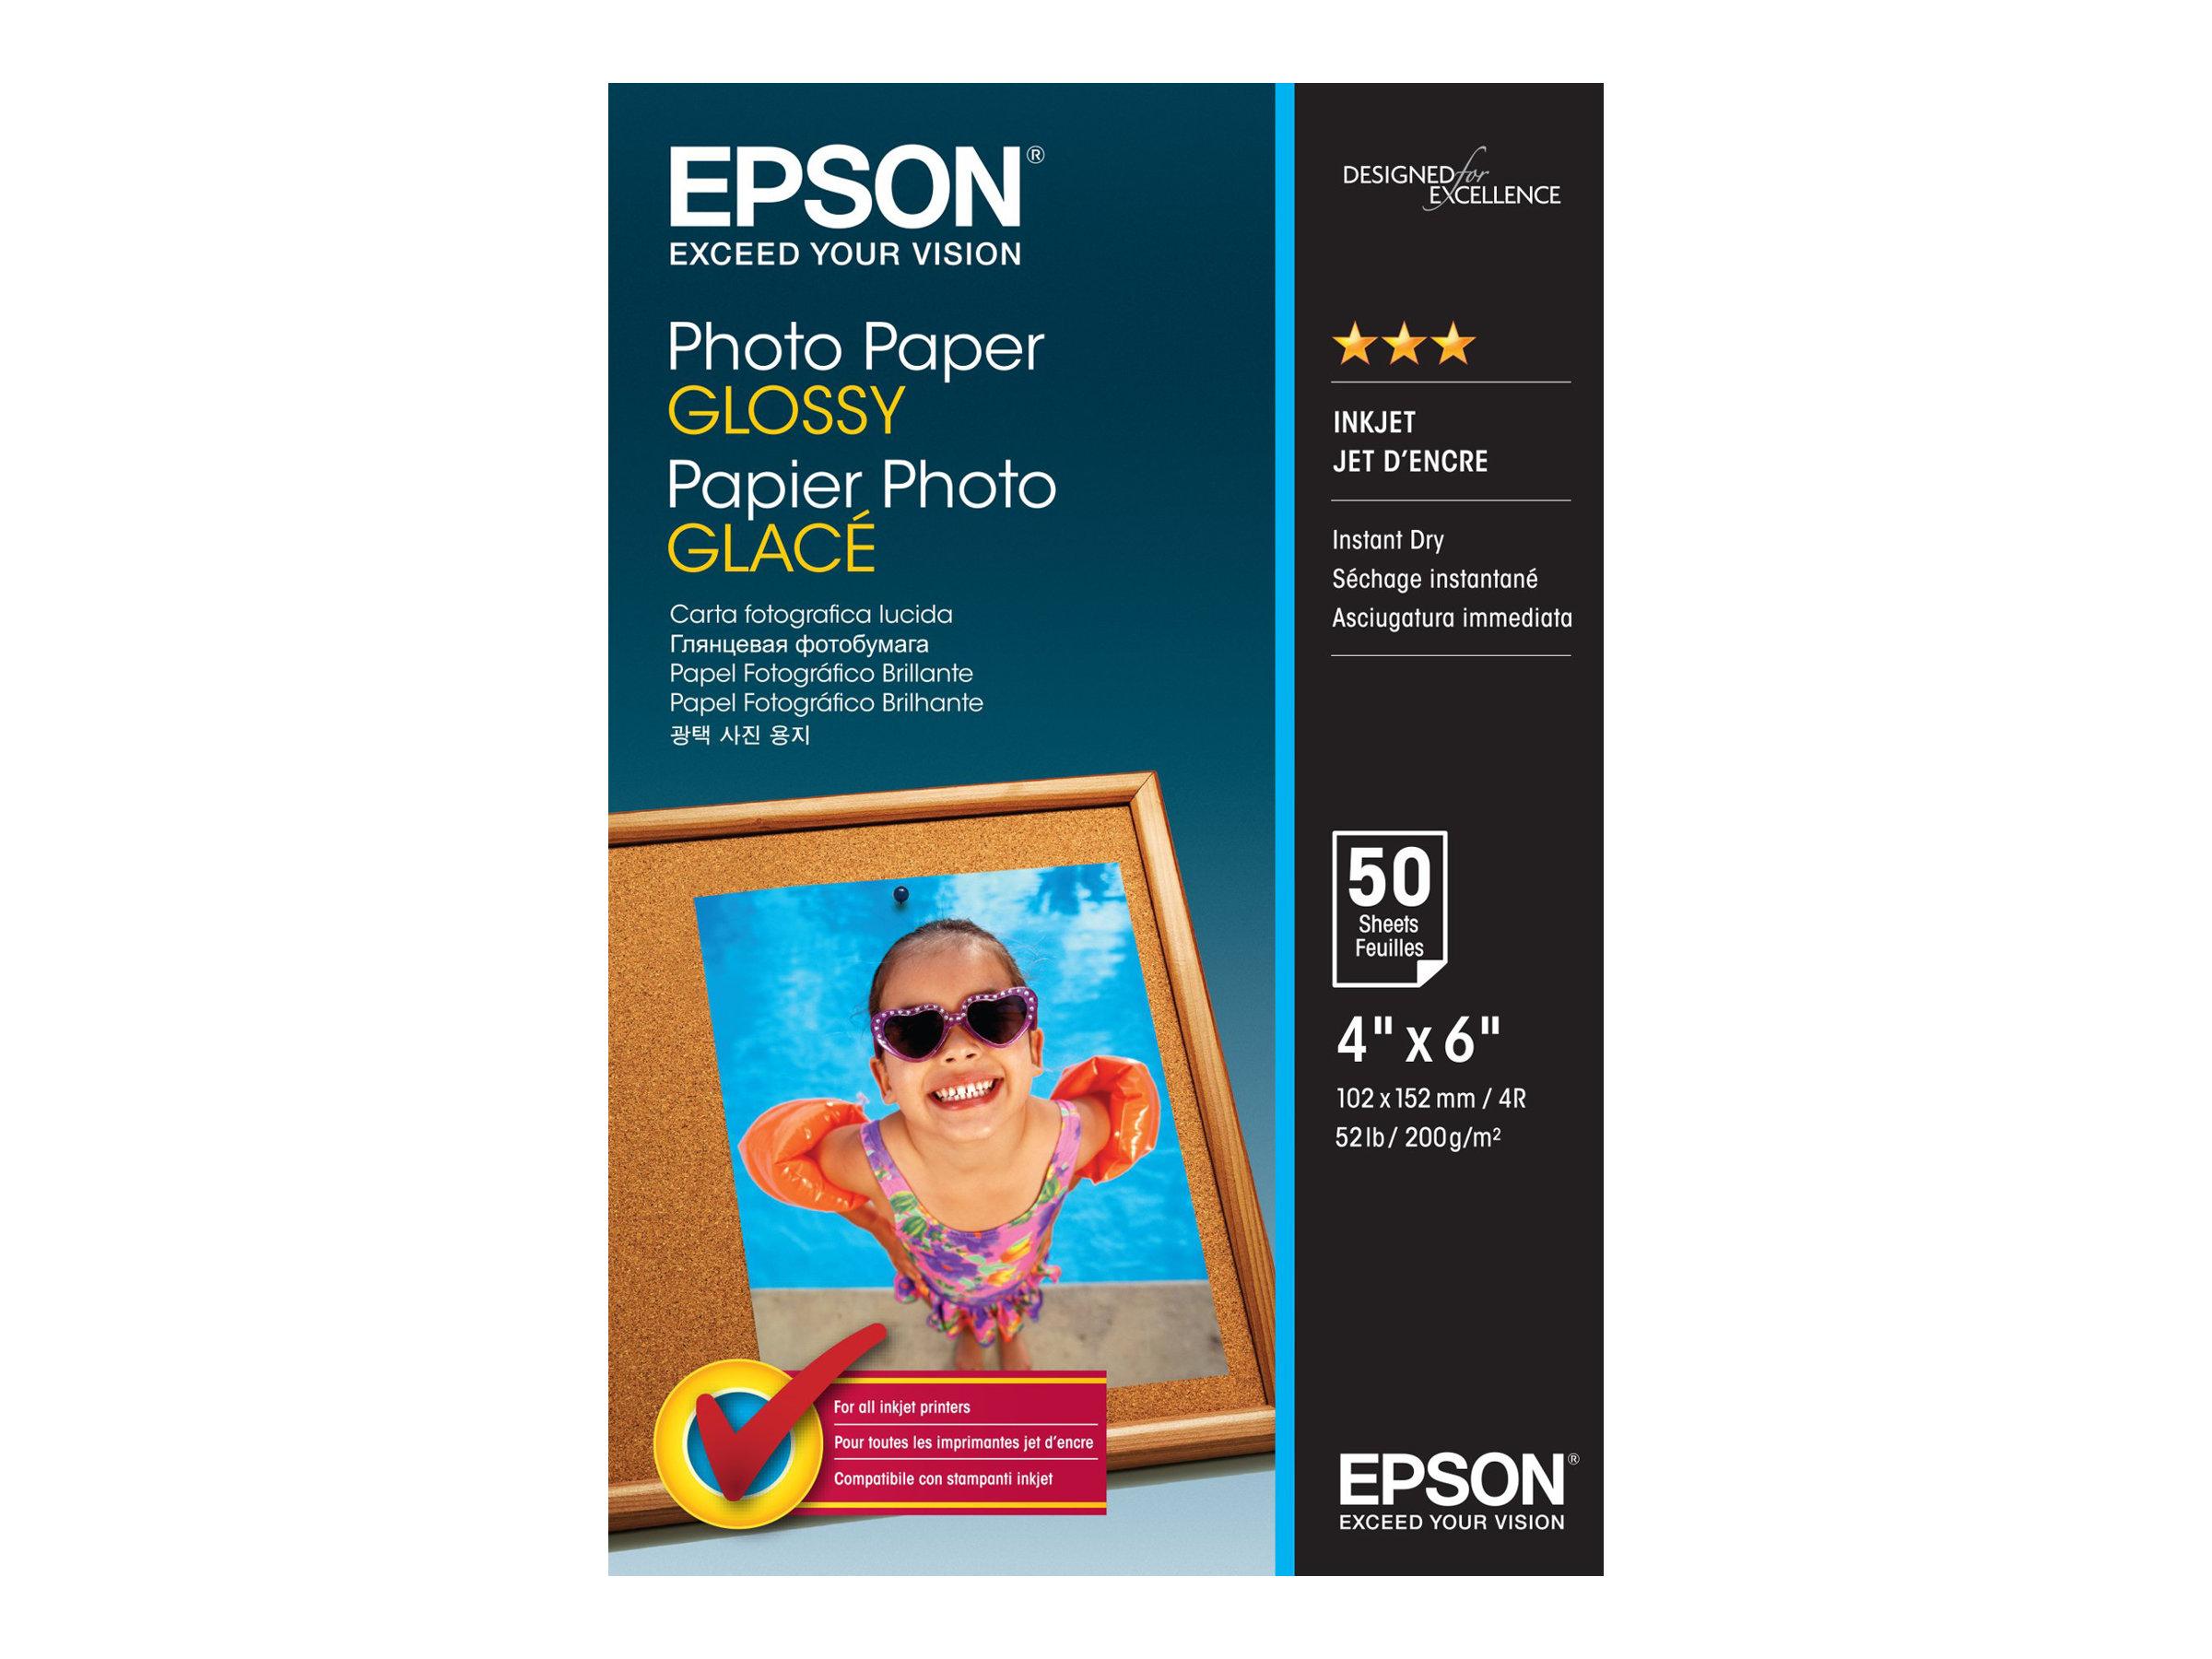 EPSON BRILLANTE 102 X 152 MM 200 GM2 50 HOJAS PAPE